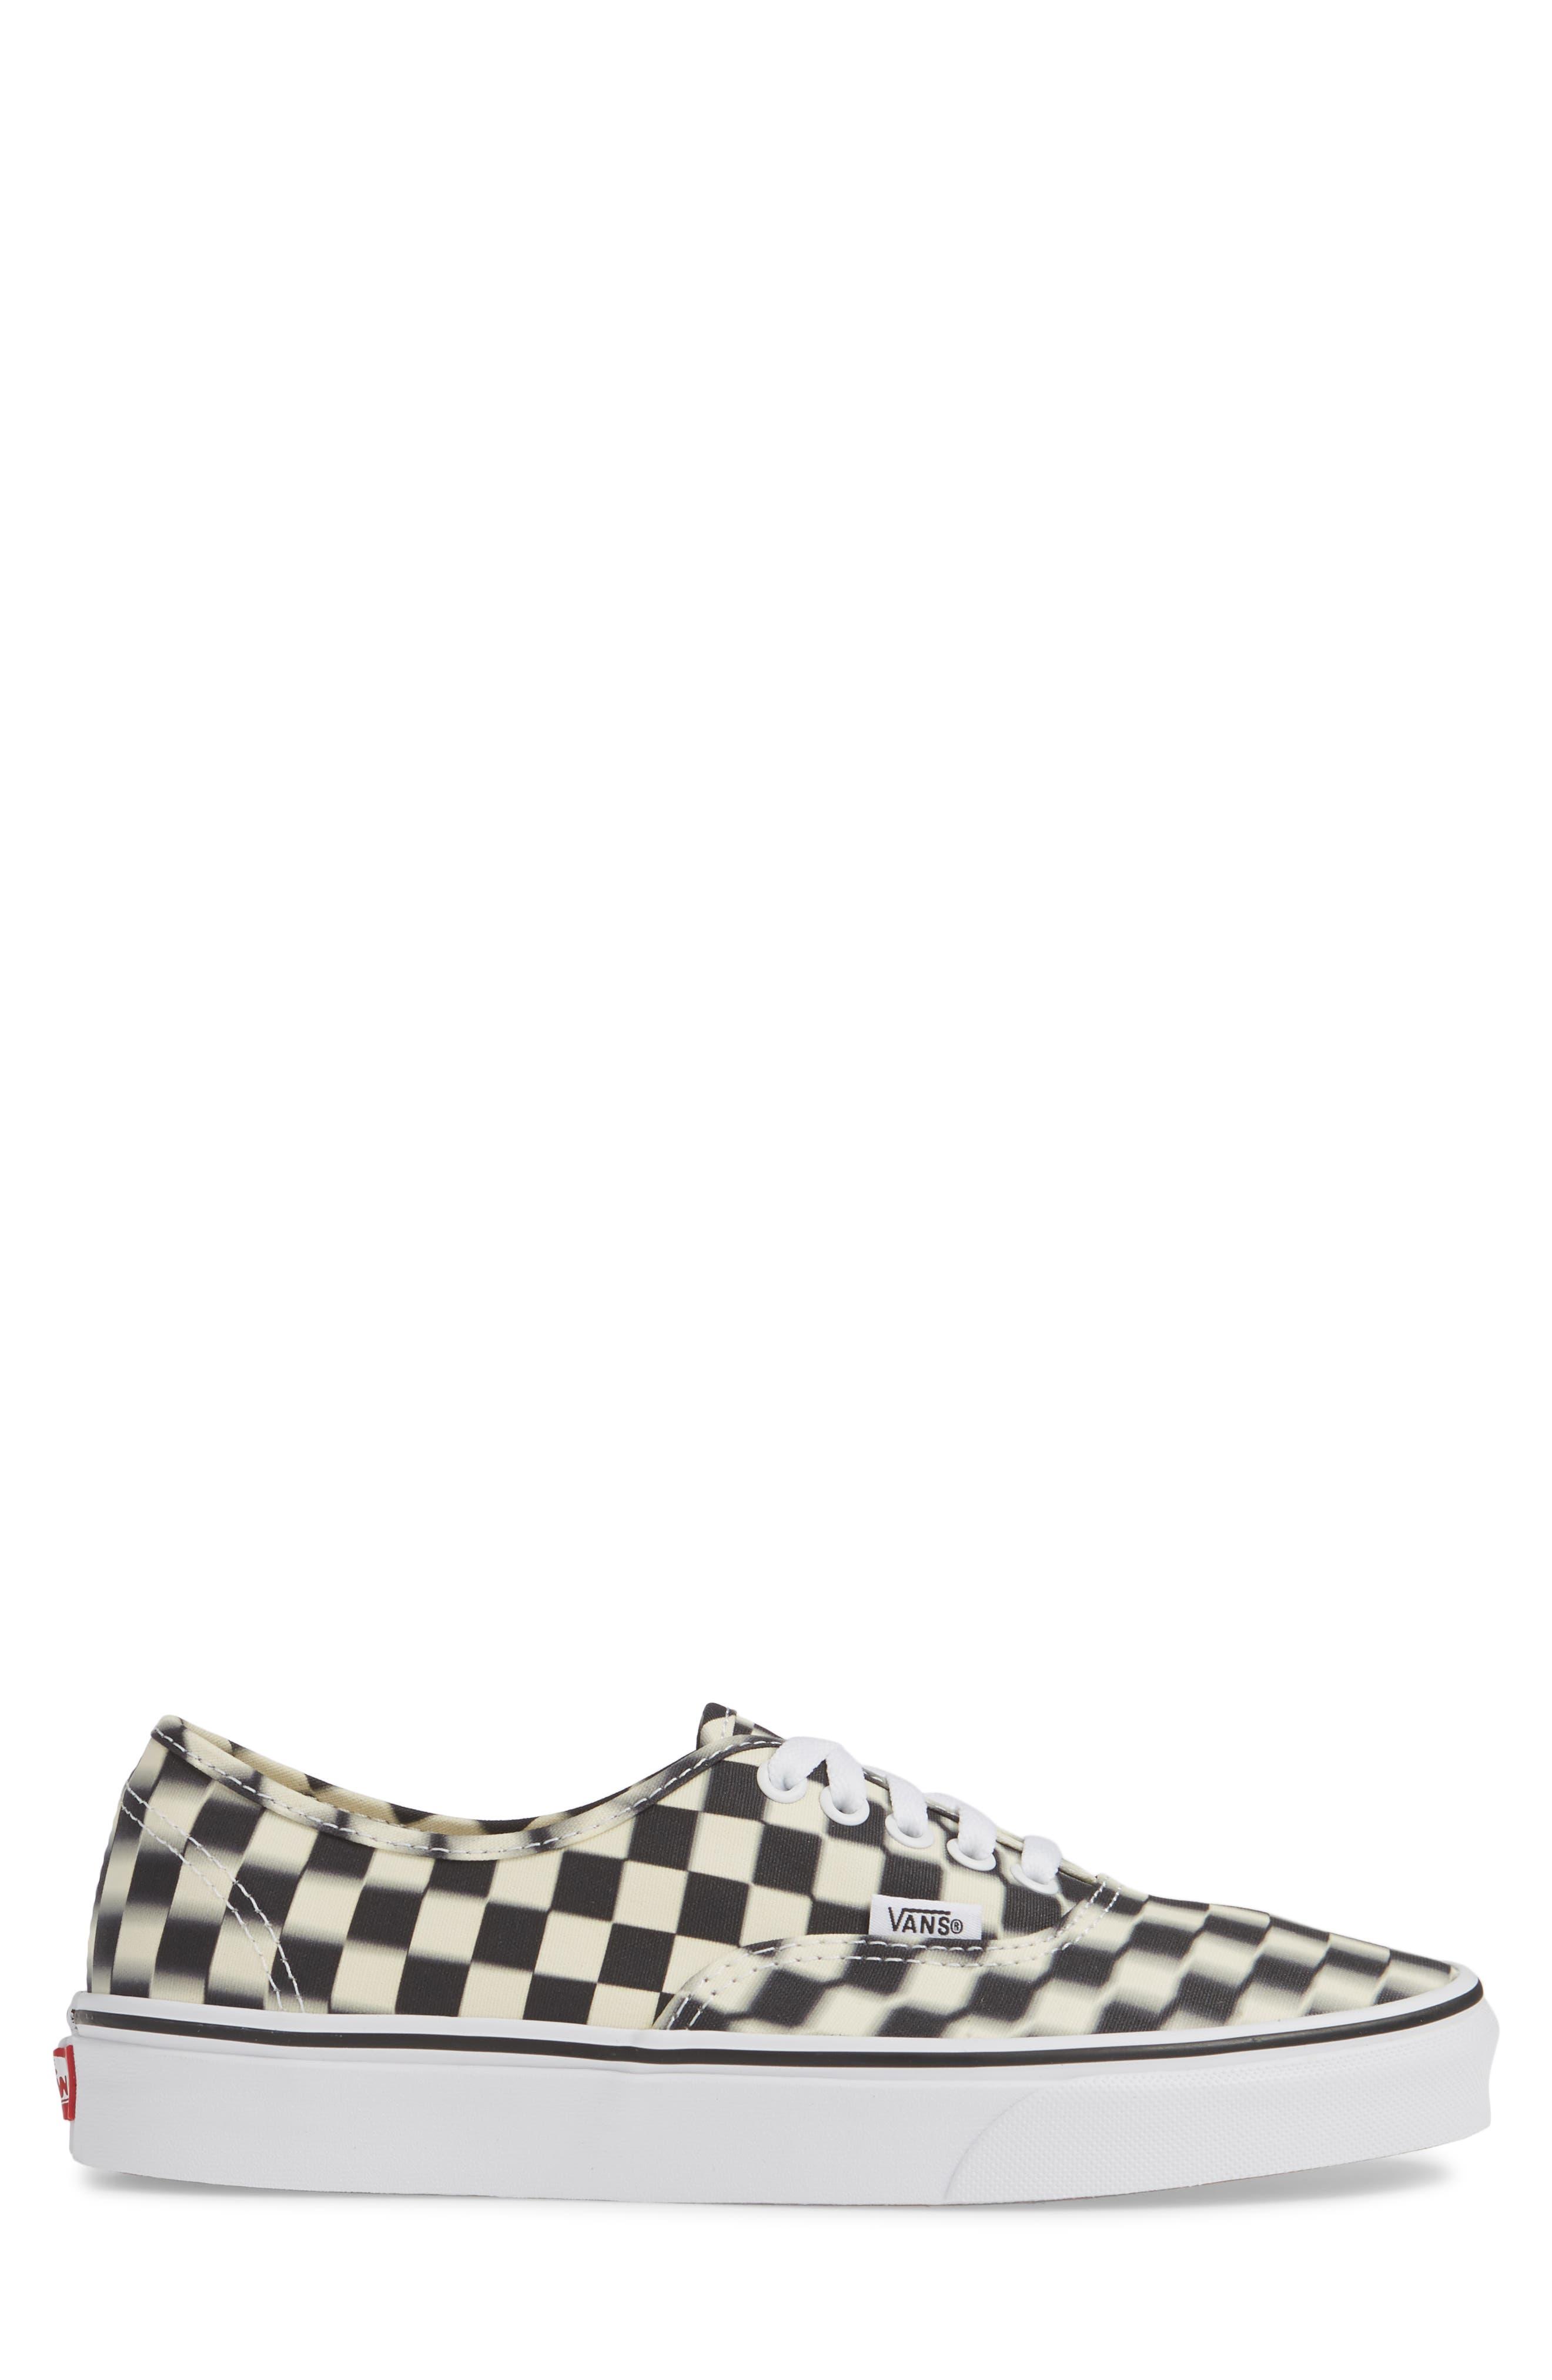 VANS,                             UA Authentic Sneaker,                             Alternate thumbnail 3, color,                             BLACK/ CLASSIC WHITE CHECK